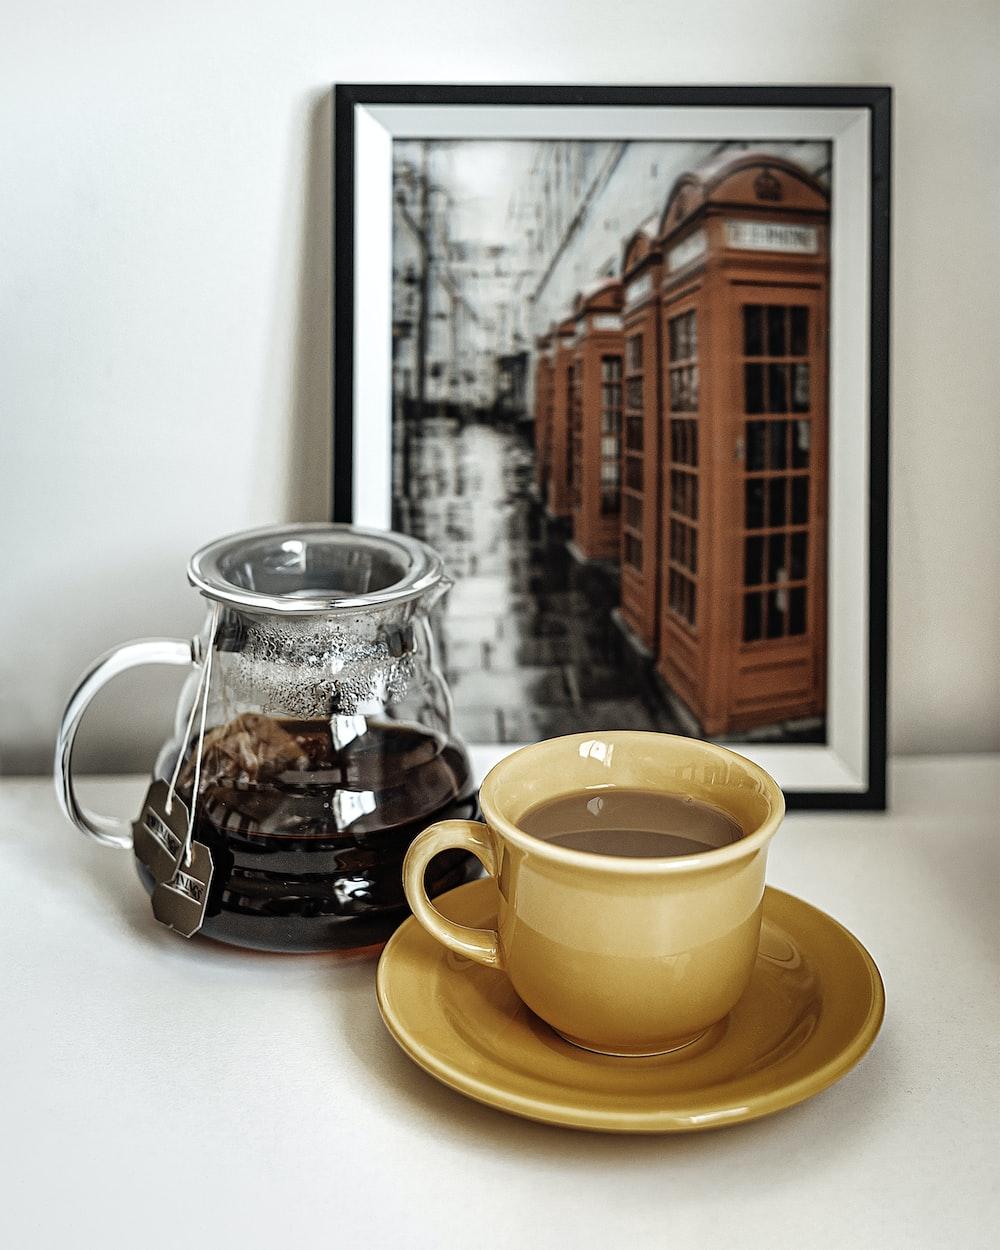 orange ceramic mug on saucer beside clear glass pitcher